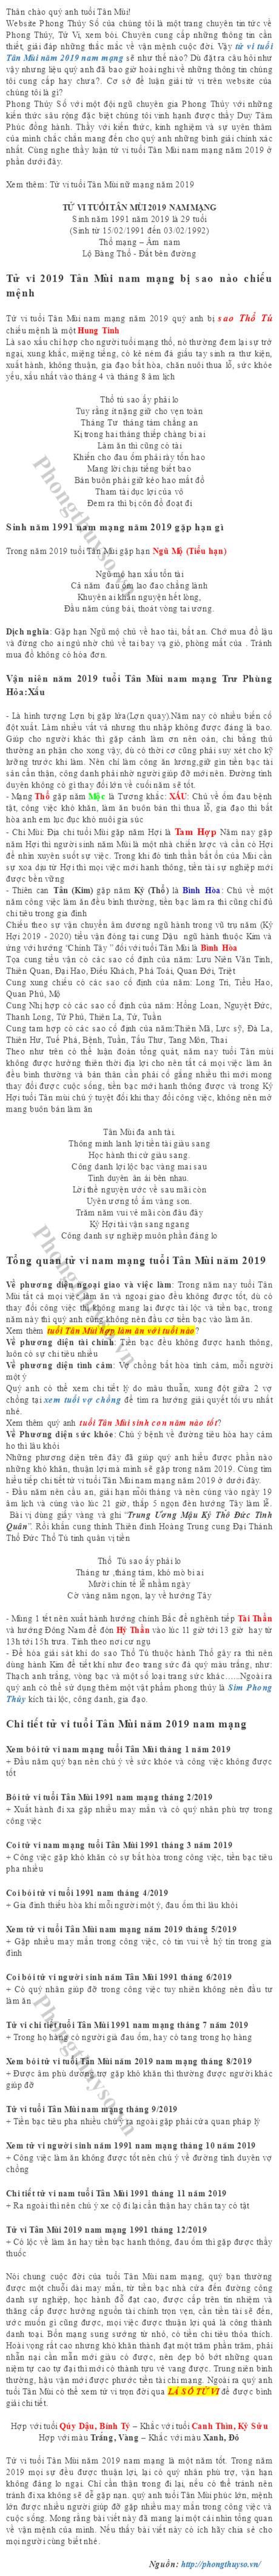 tu-vi-tuoi-tan-mui-nam-2019-nam-mang